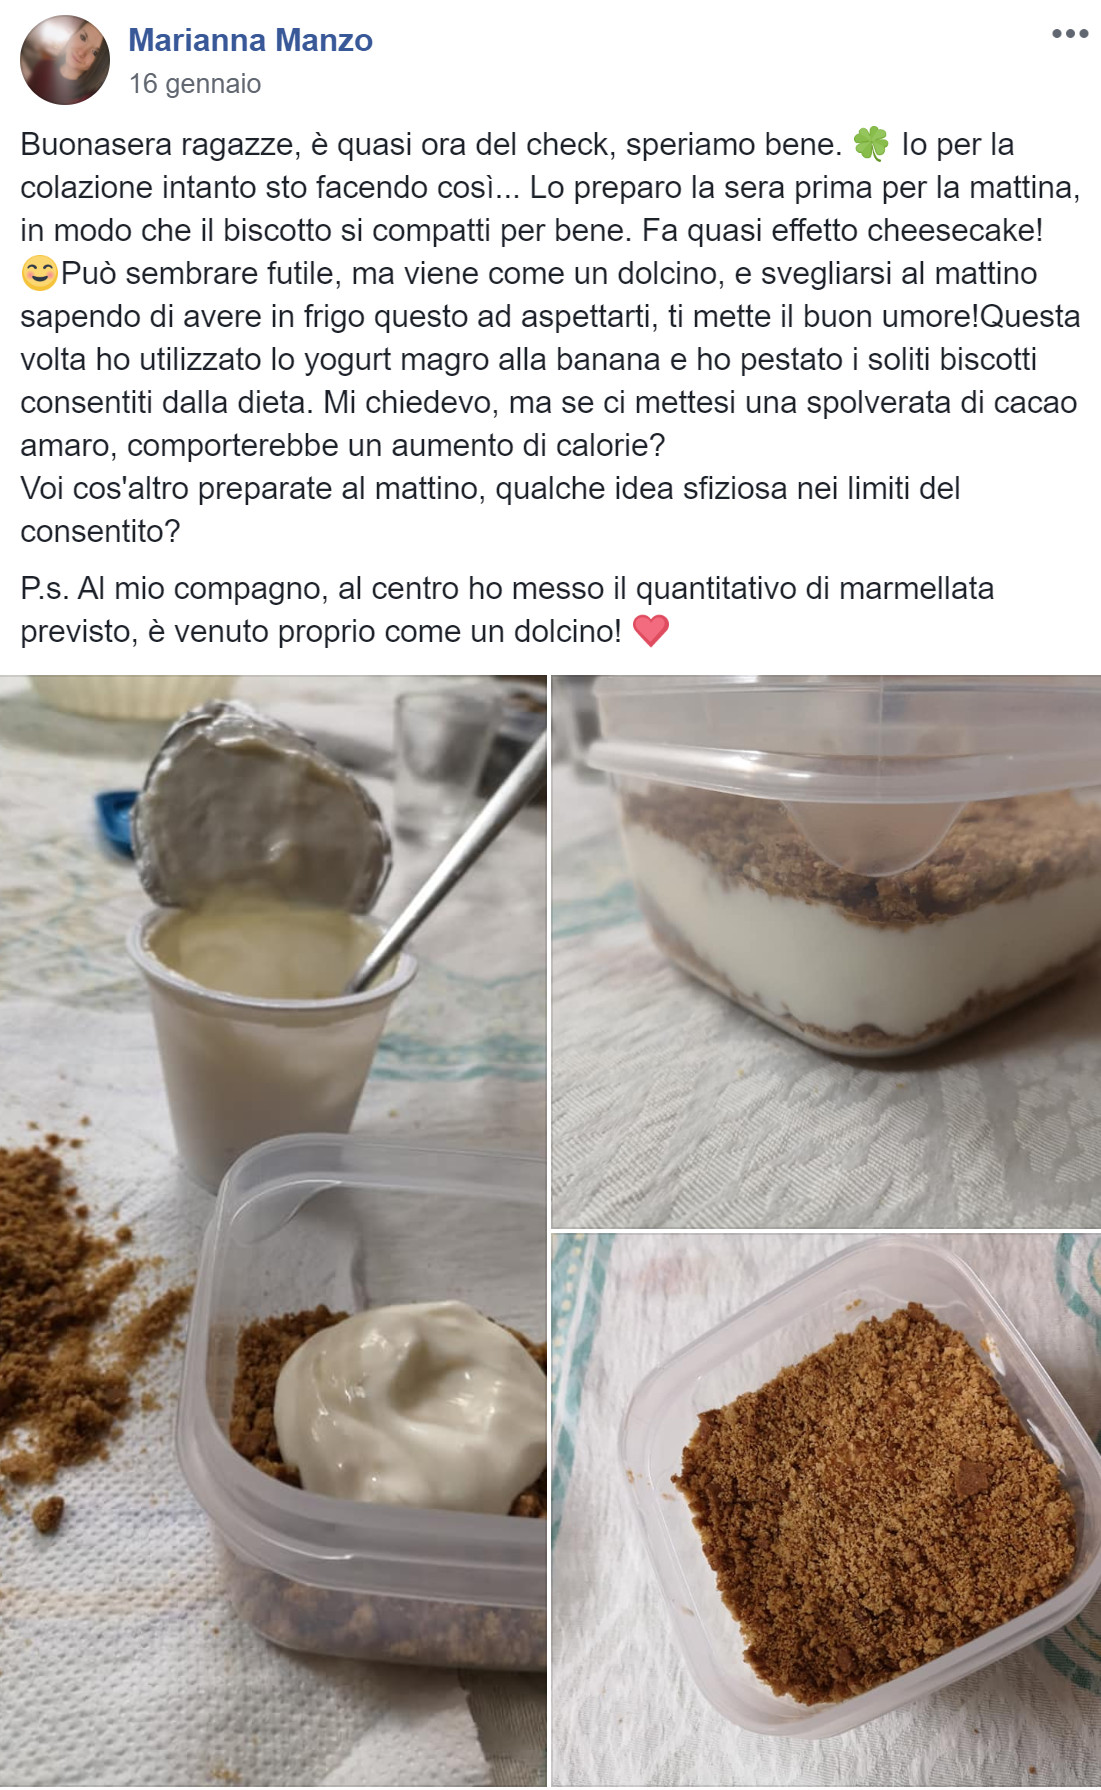 finta cheesecake ricetta marianna